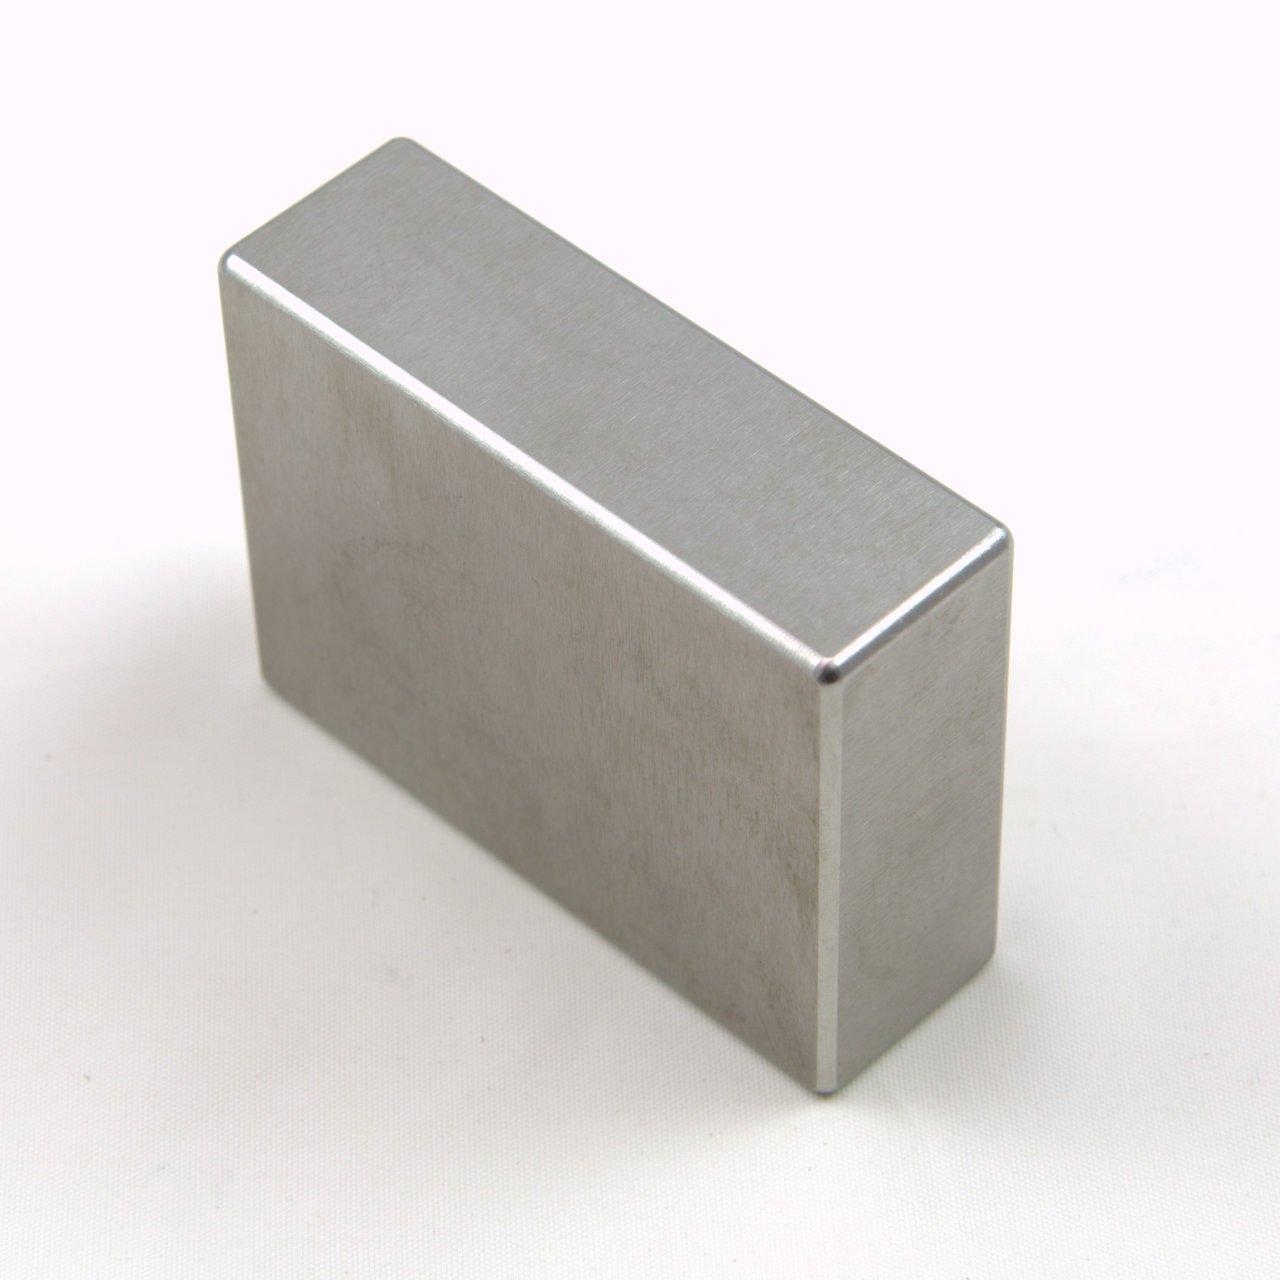 Tungsten Ergonomic Bucking Bar BB-4: 1.21 lbs, 5/8'' x 1.5'' x 2''